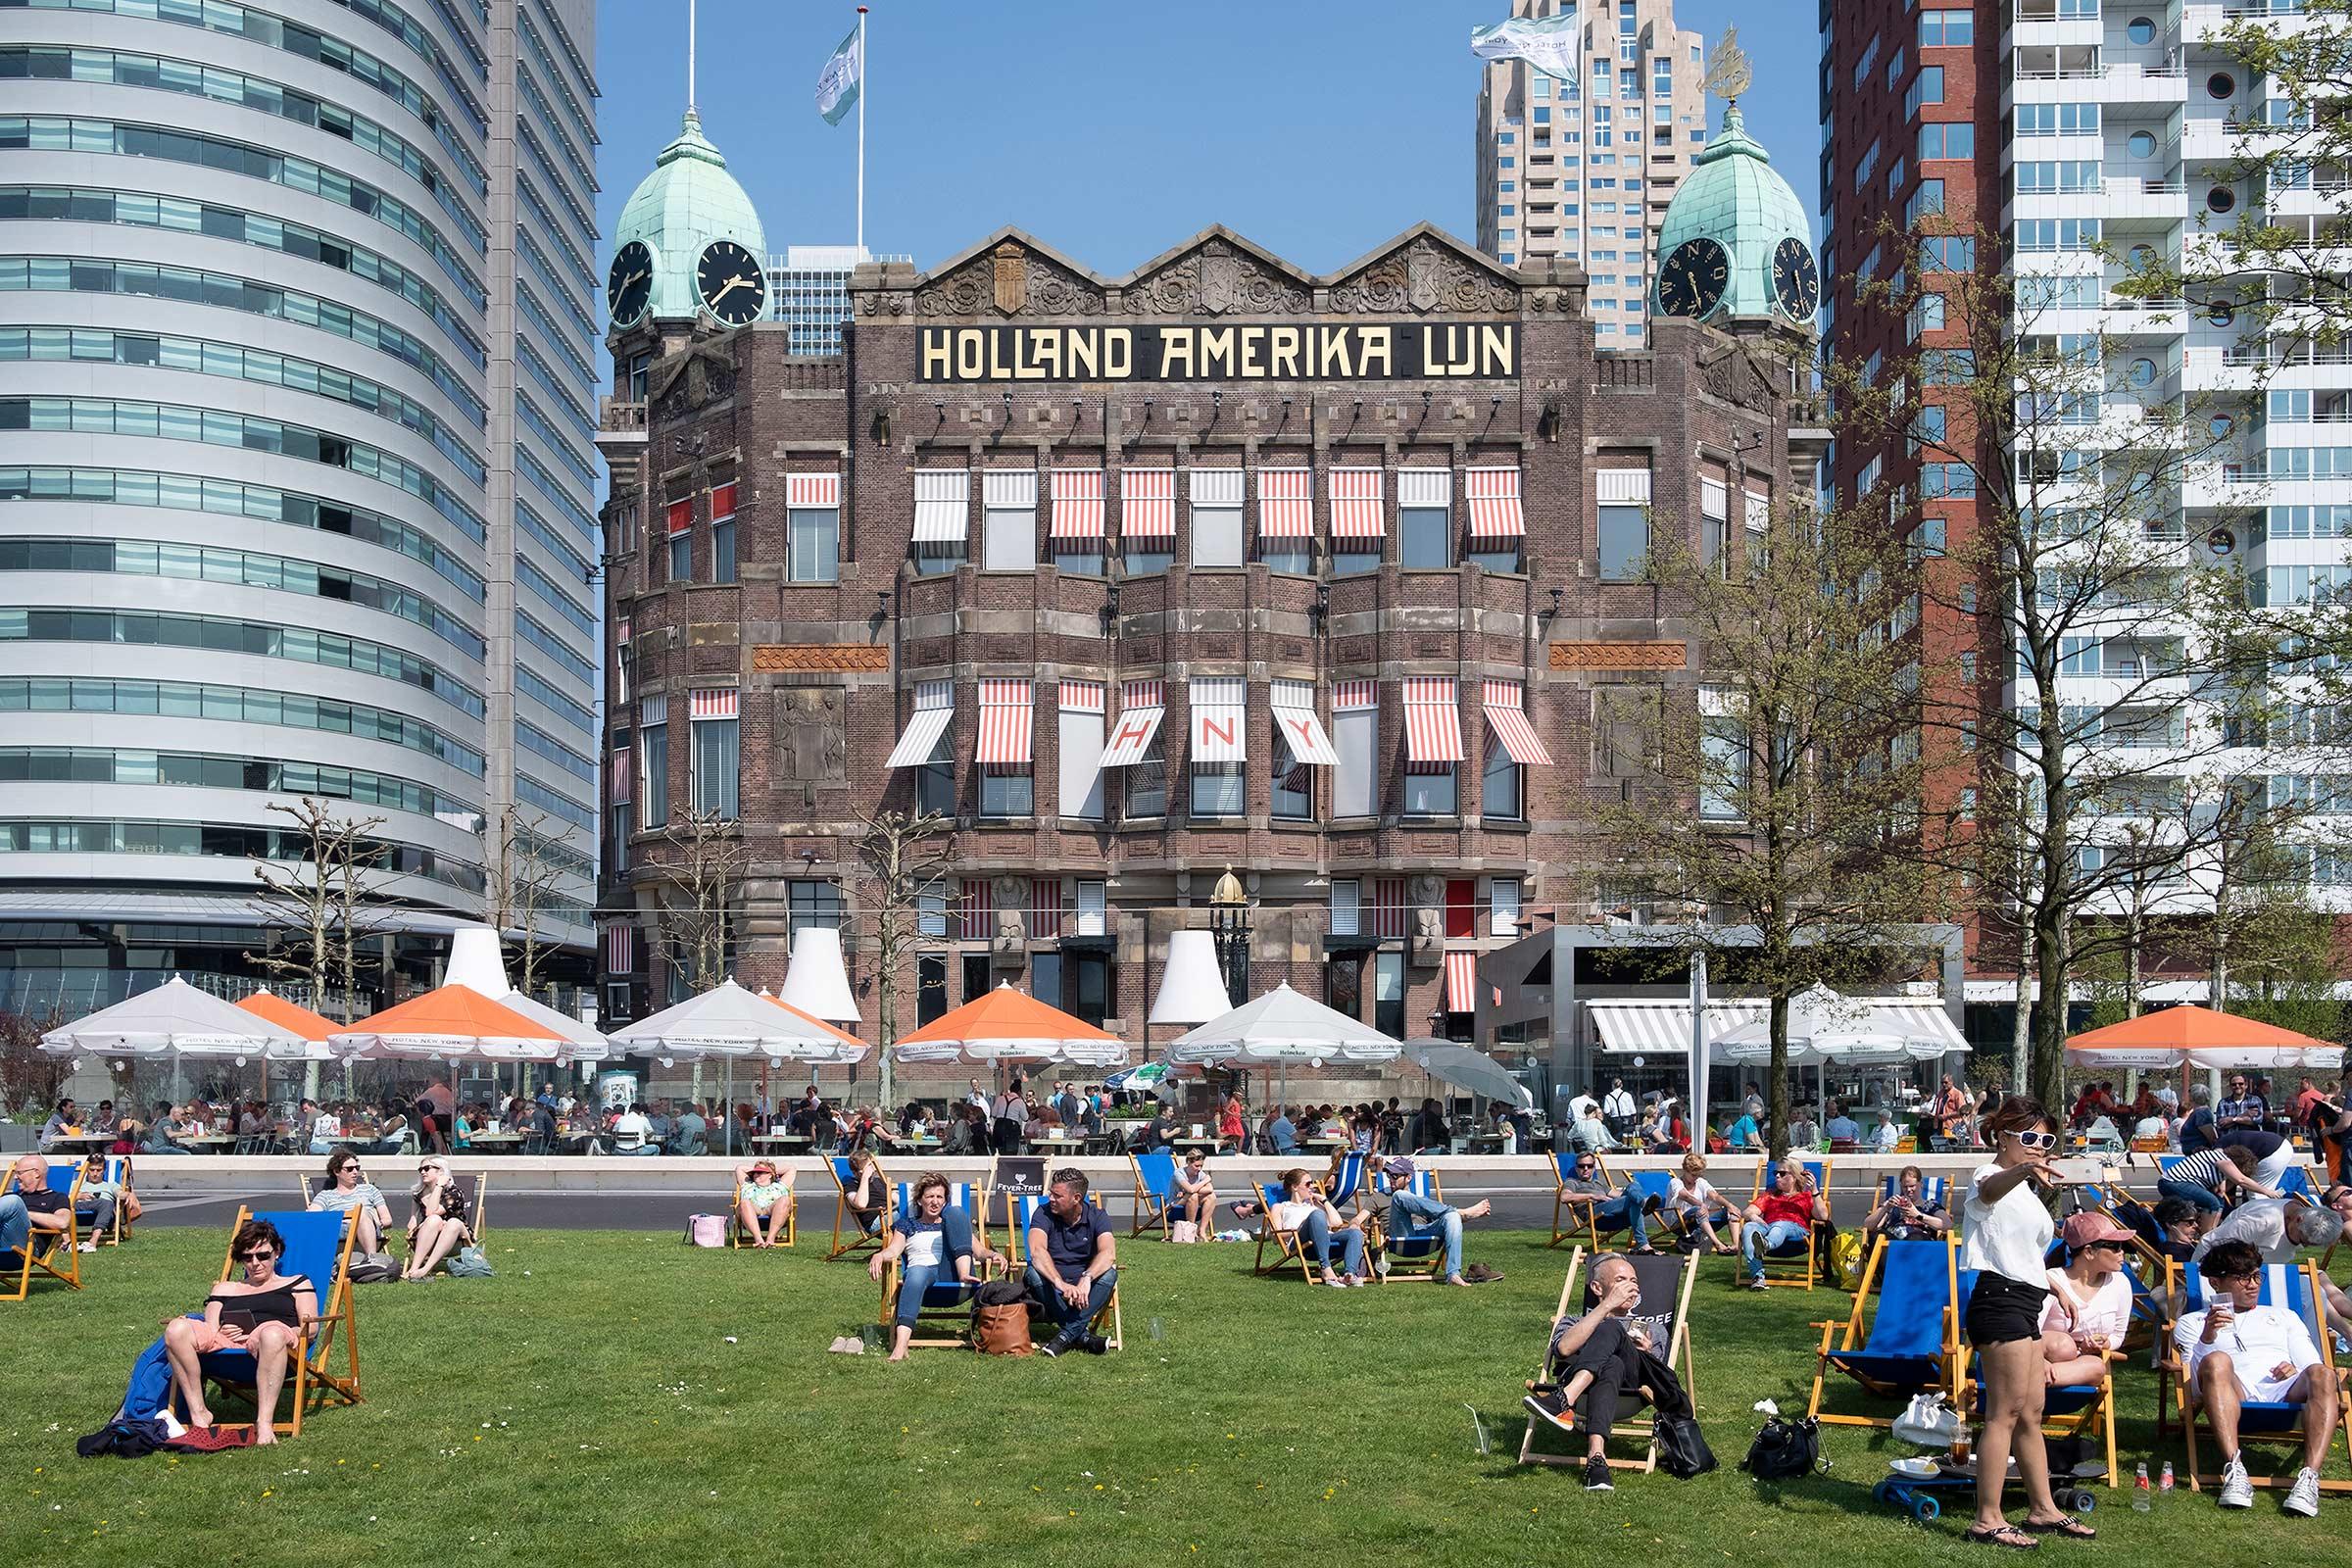 Bert Hotel New York Rotterdam 22 april 2018